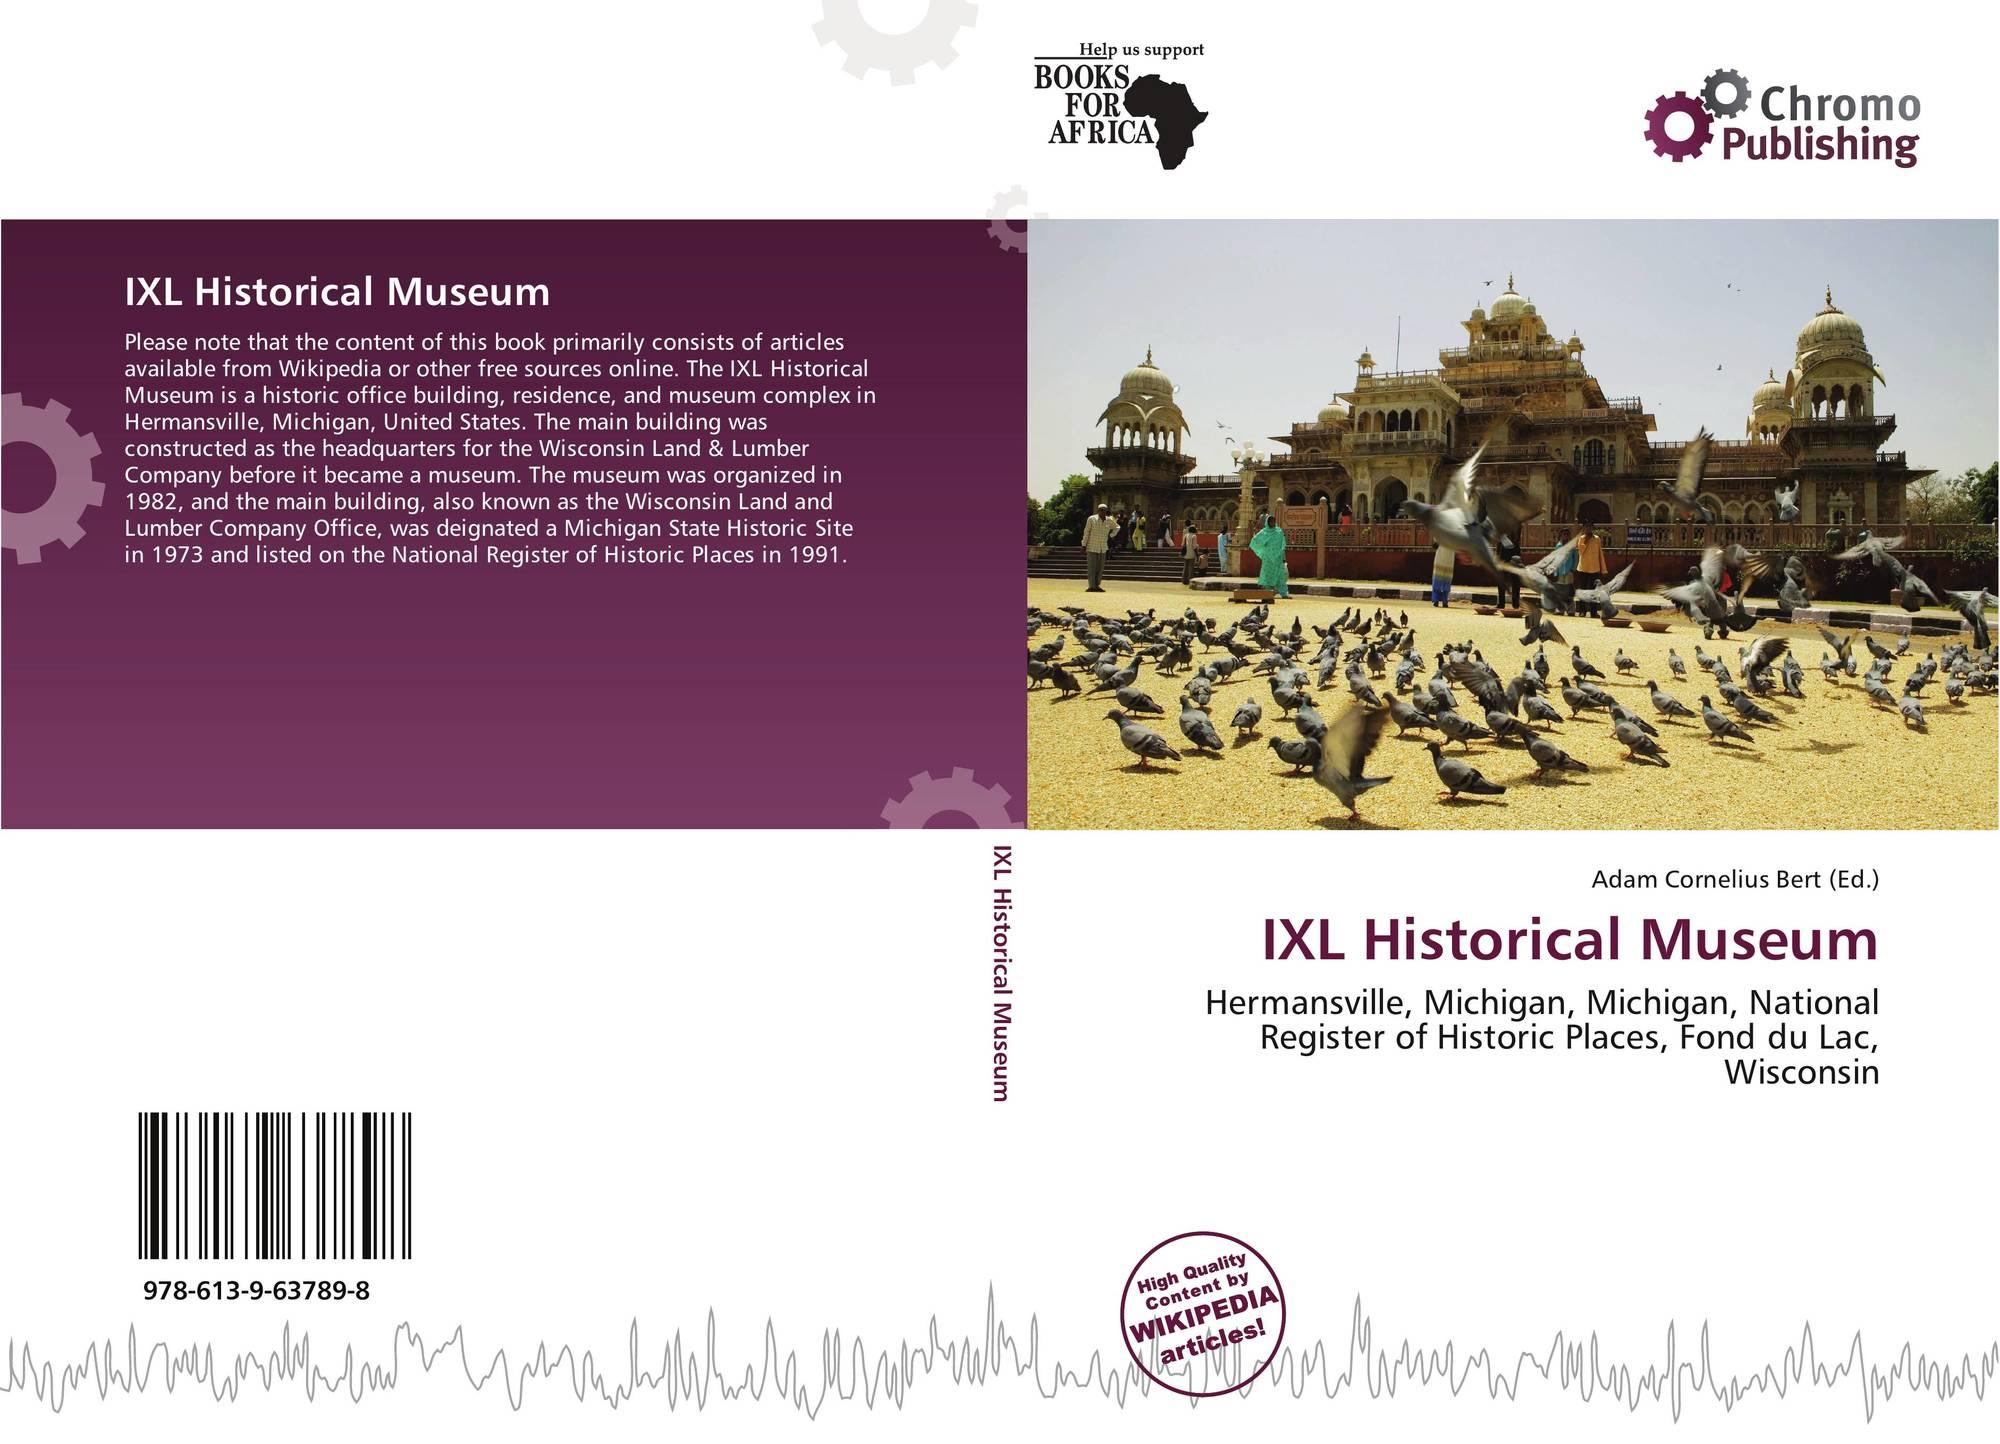 IXL Historical Museum, 978-613-9-63789-8, 6139637899 ,9786139637898